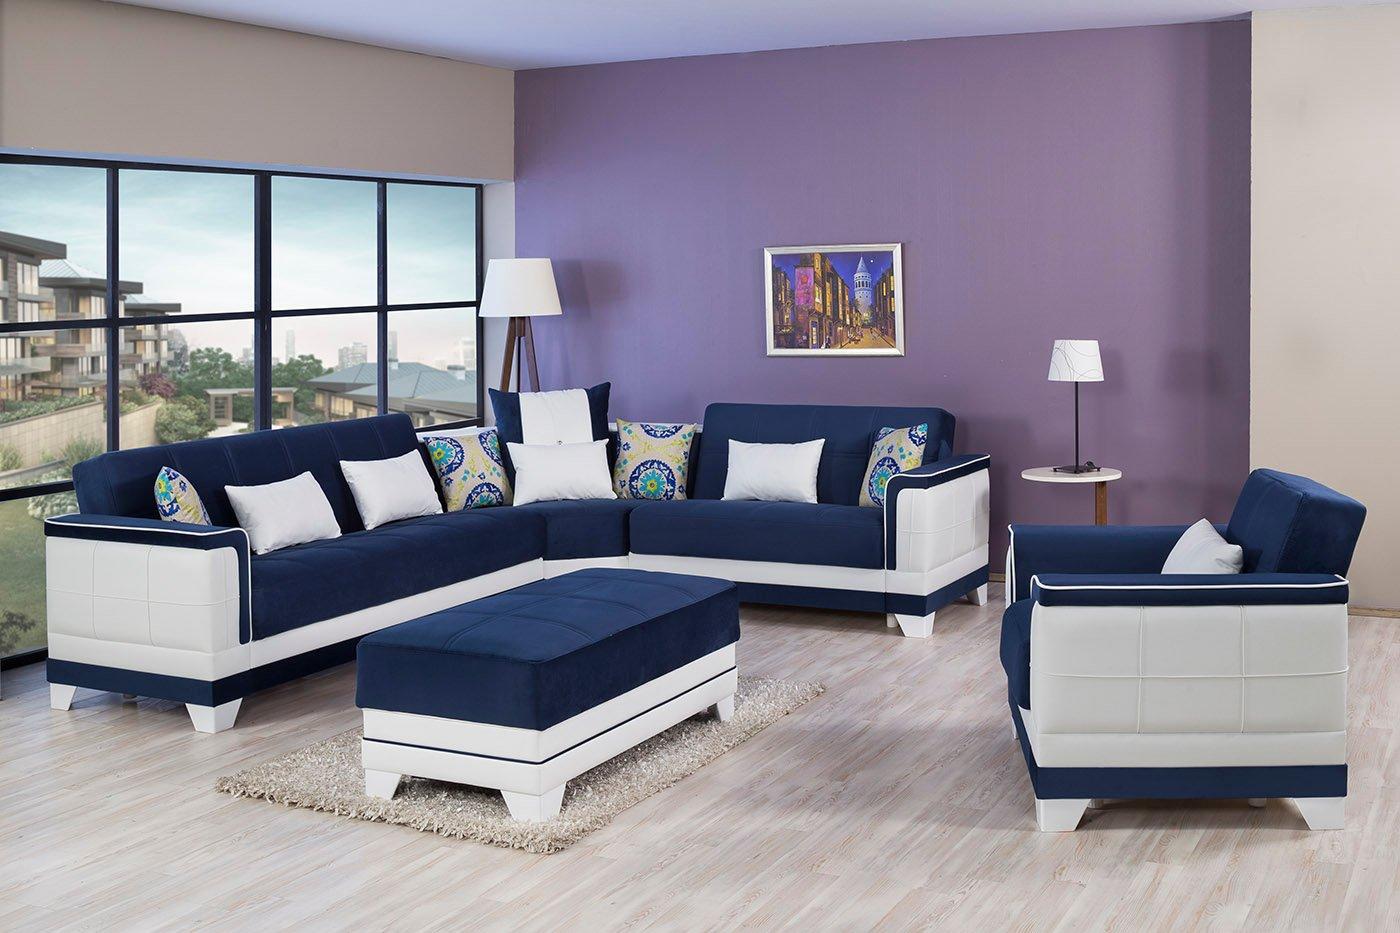 Four Seasons Riva Dark Blue Sectional Sofa By Casamode